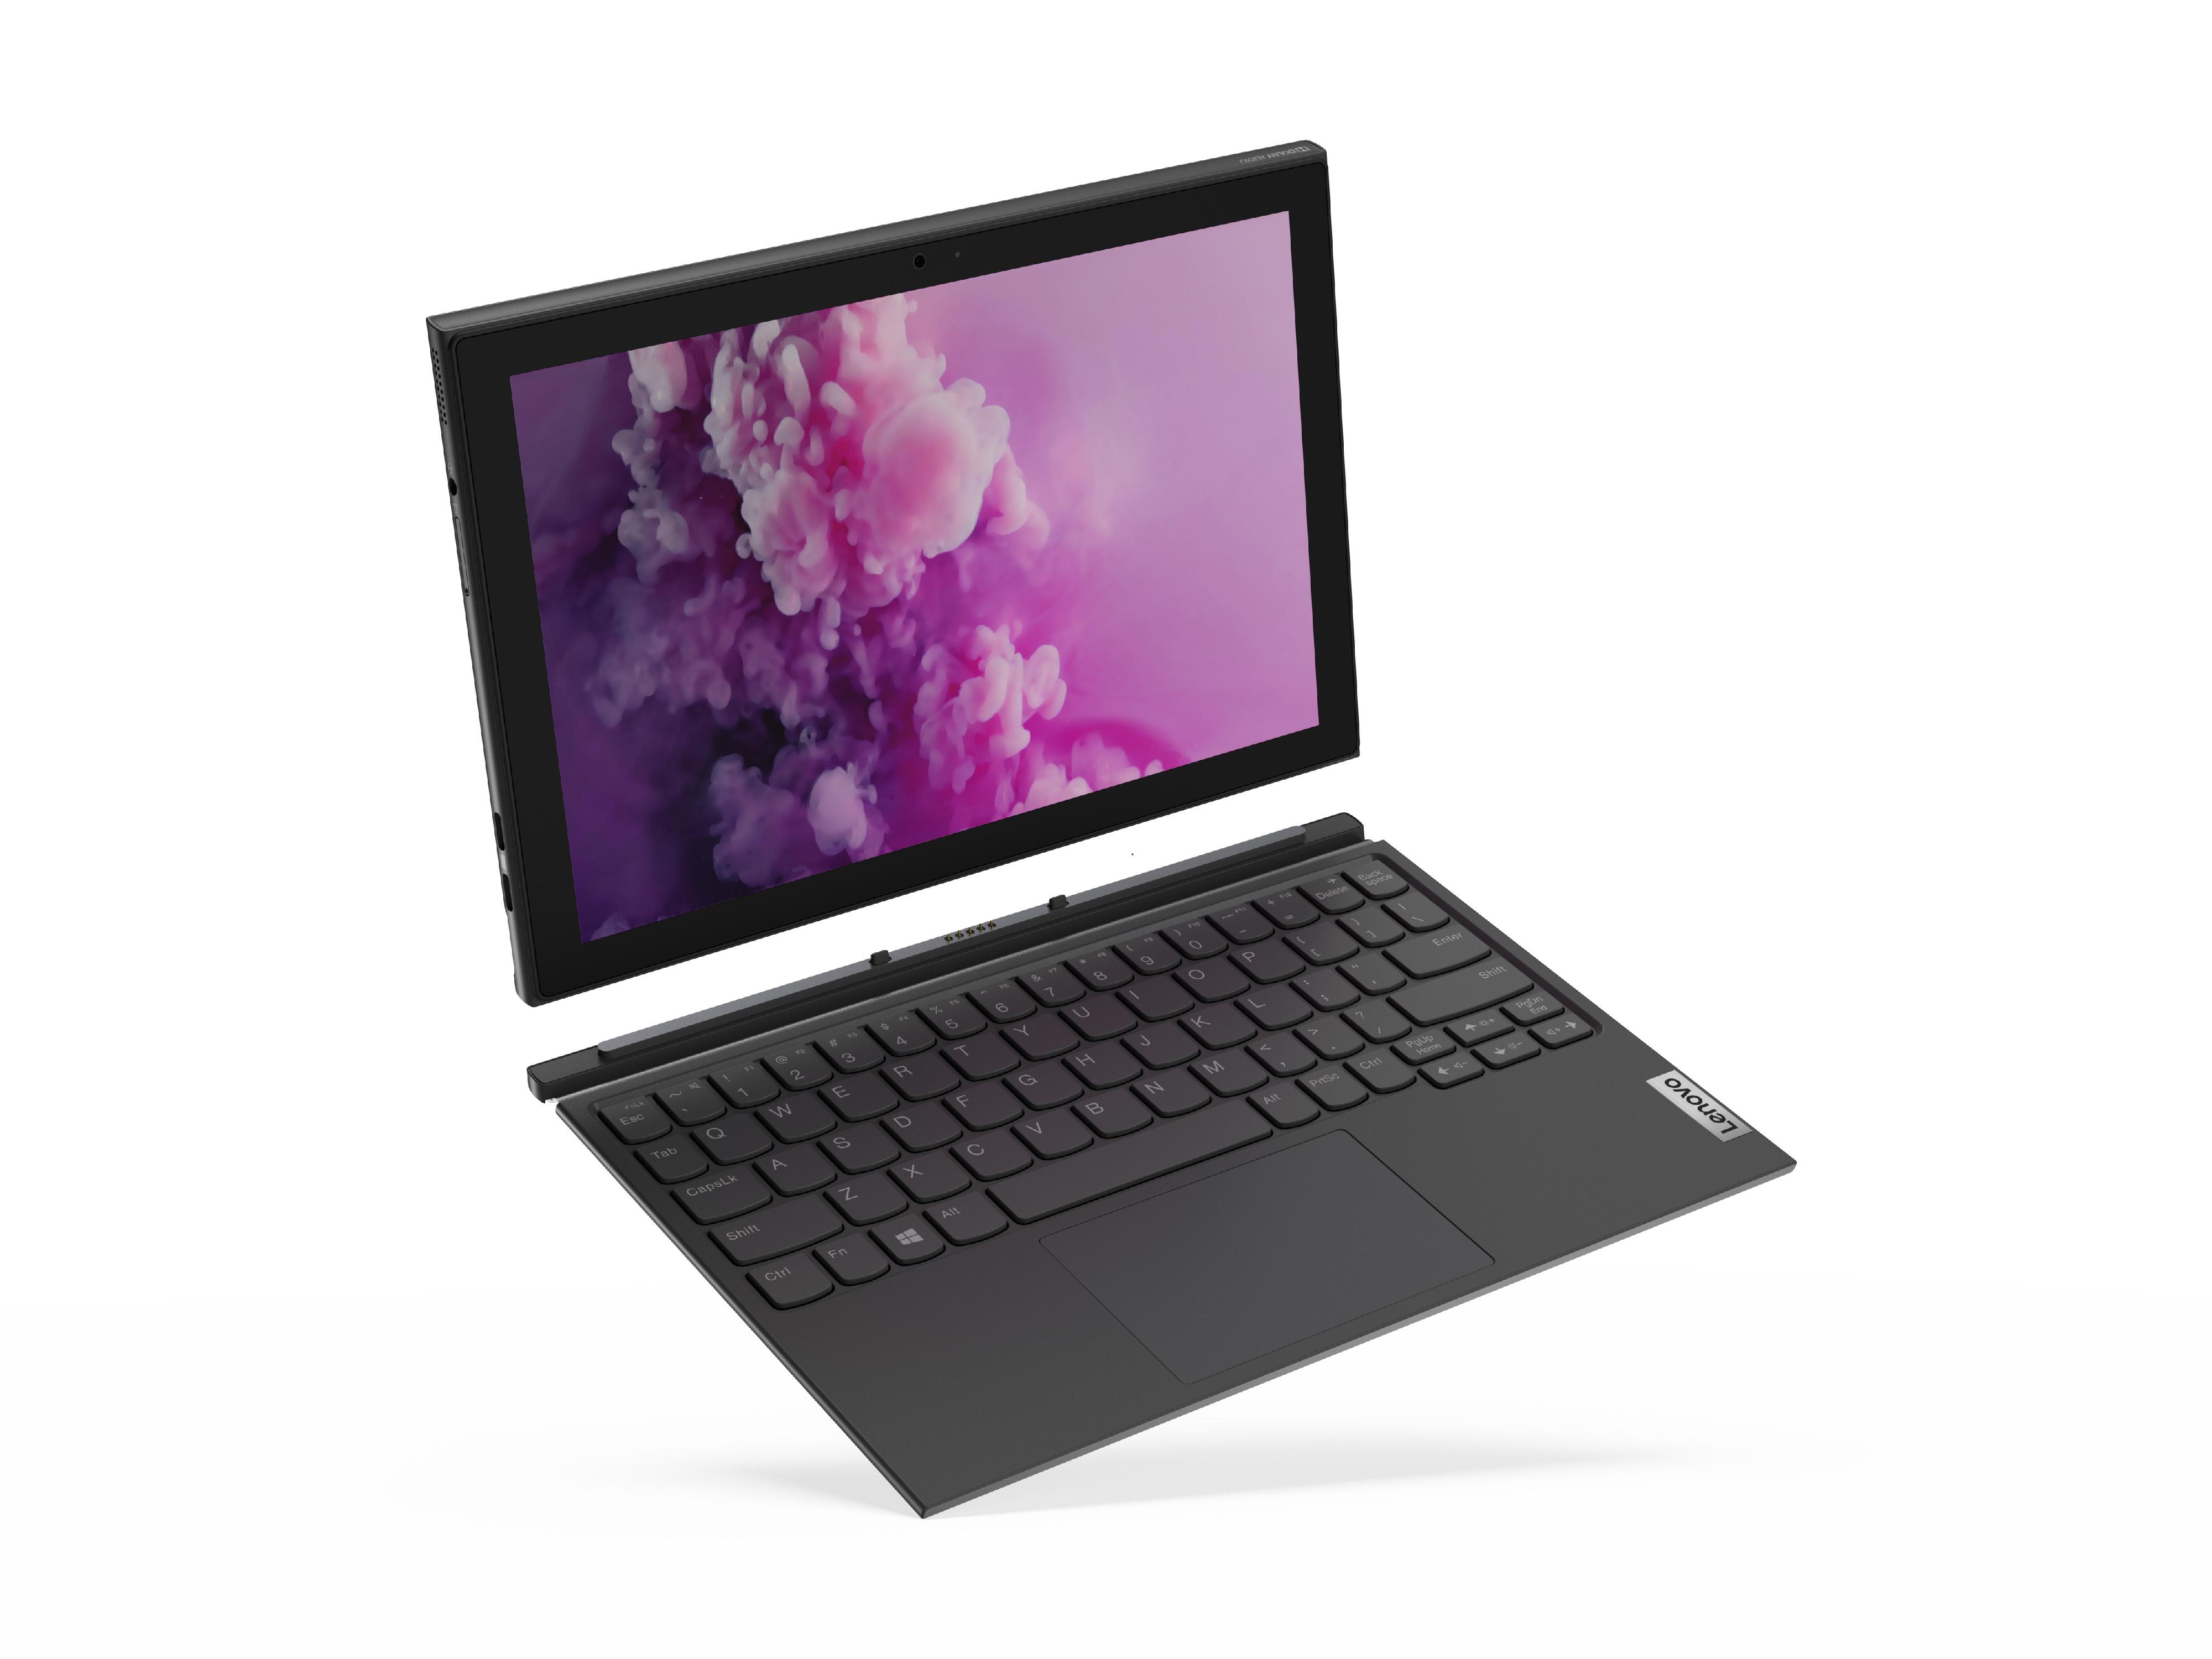 Фото  Планшет Lenovo ideapad Duet 3 N4020 4/64 Win10P Graphite Grey (82AT005ERU)